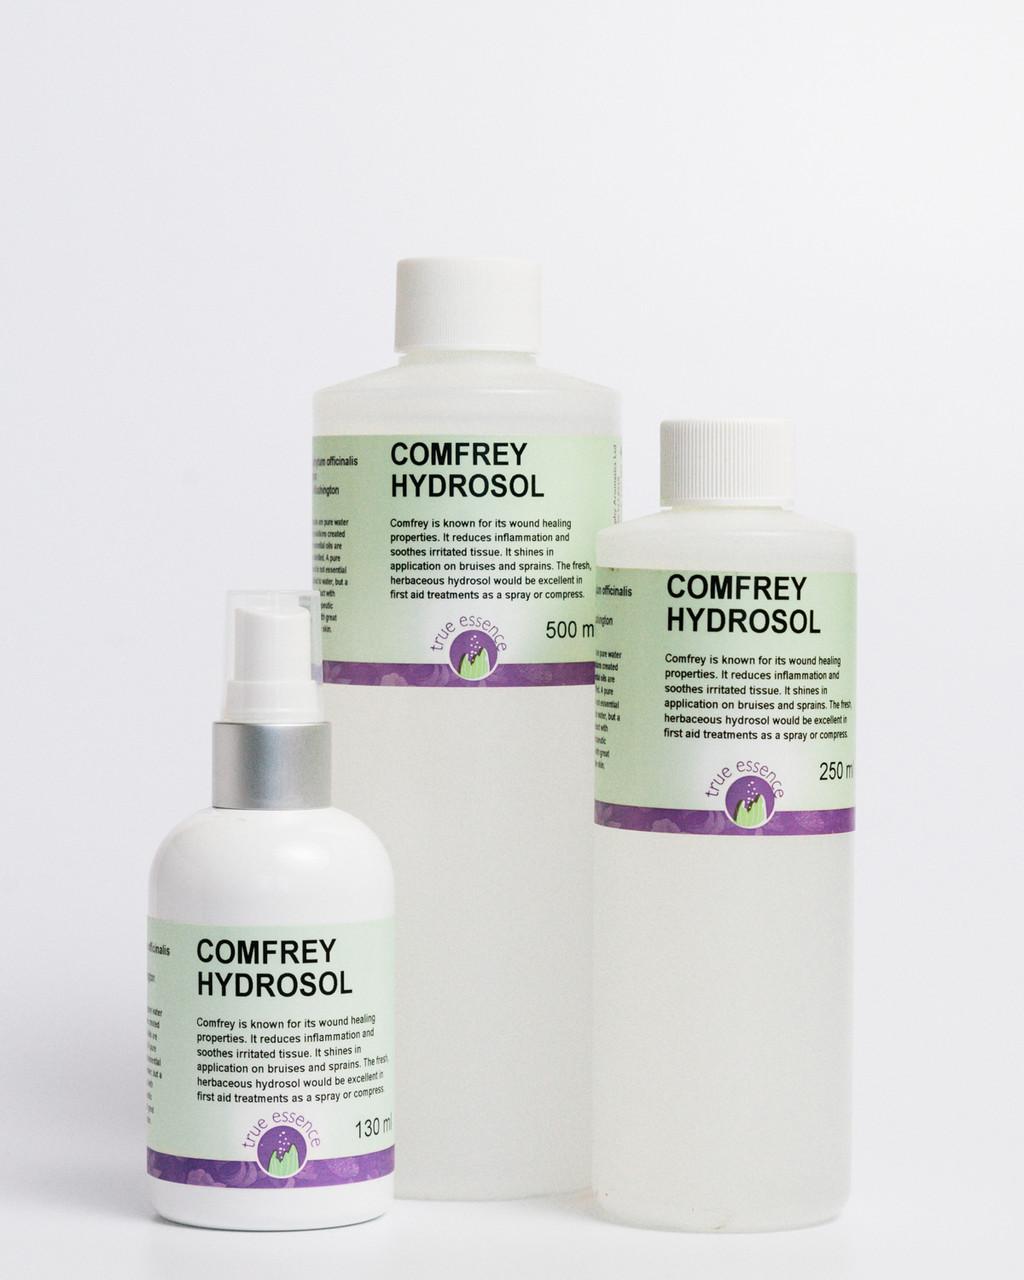 COMFREY (Symphytum officinalis) Hydrosol